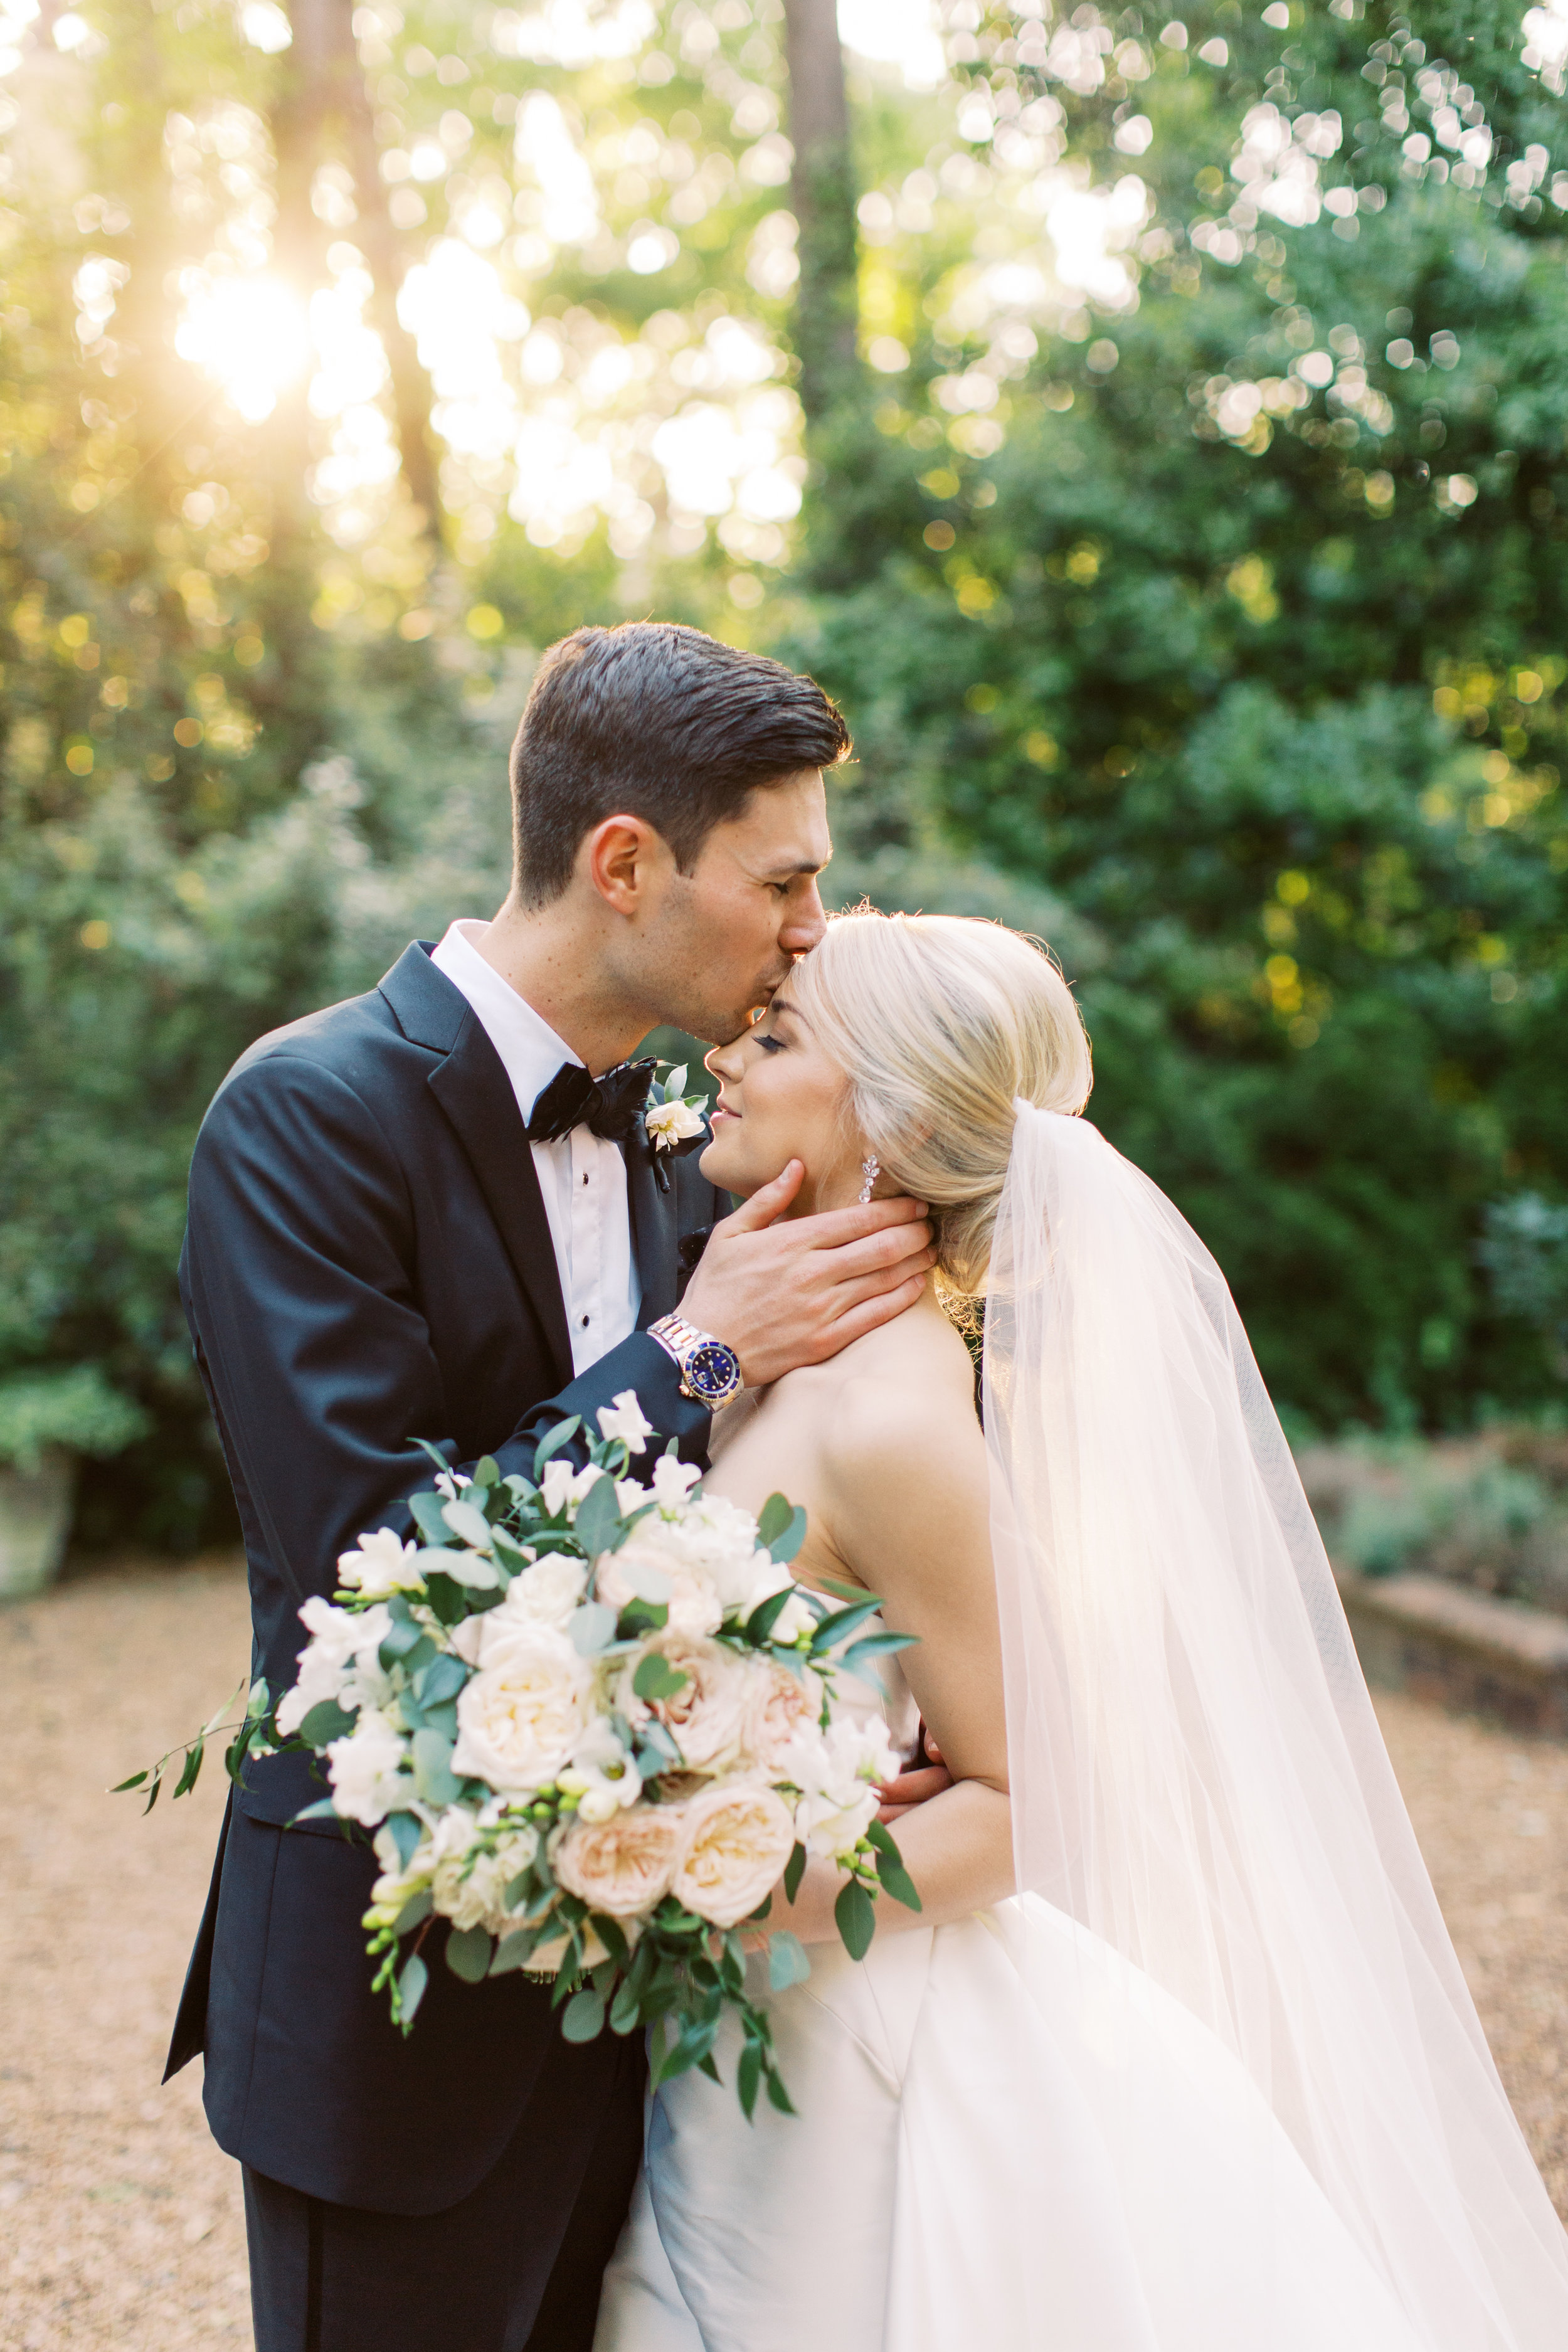 Marie_Perry_Duke_Mansion_Wedding_Charlotte_NC_Abigail_Malone_Photography-475.jpg